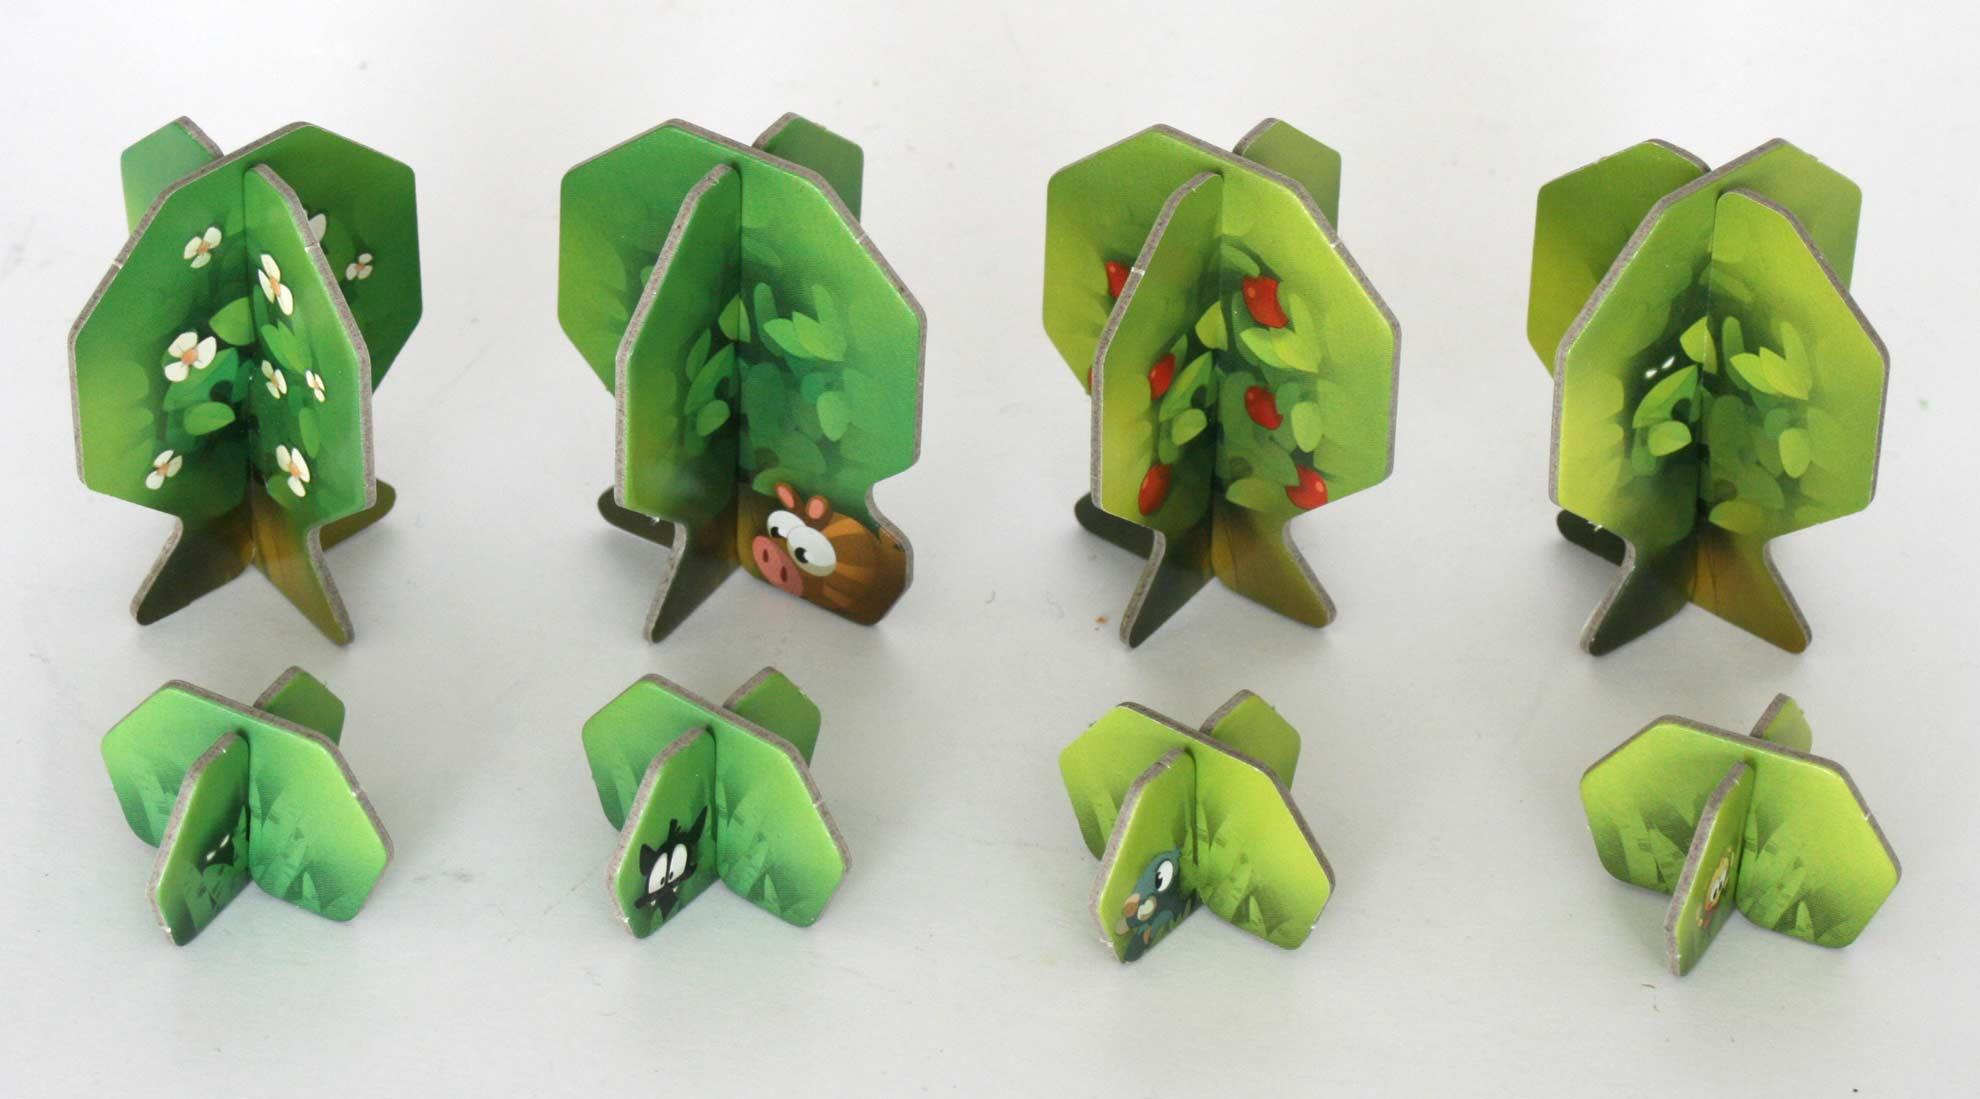 Krosmaster_01_arbres_buissons